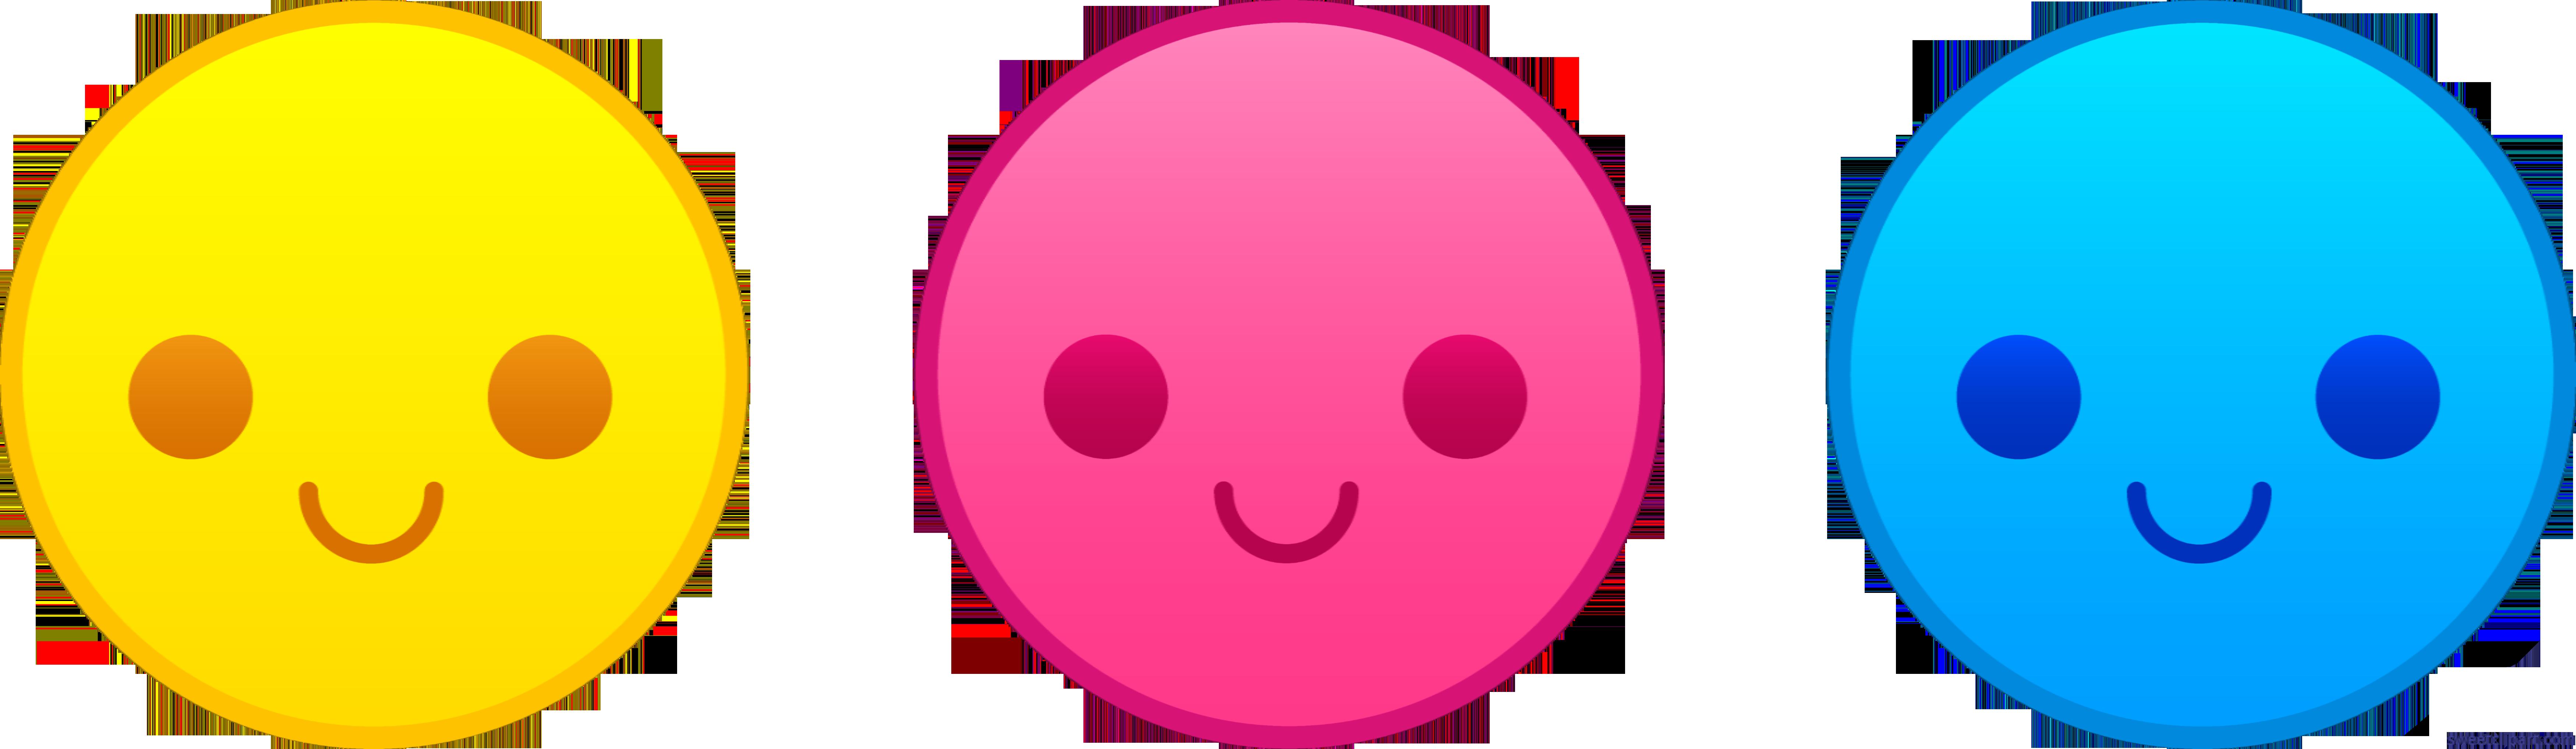 clipart stock Emoticons faces clip art. Clipart happy face